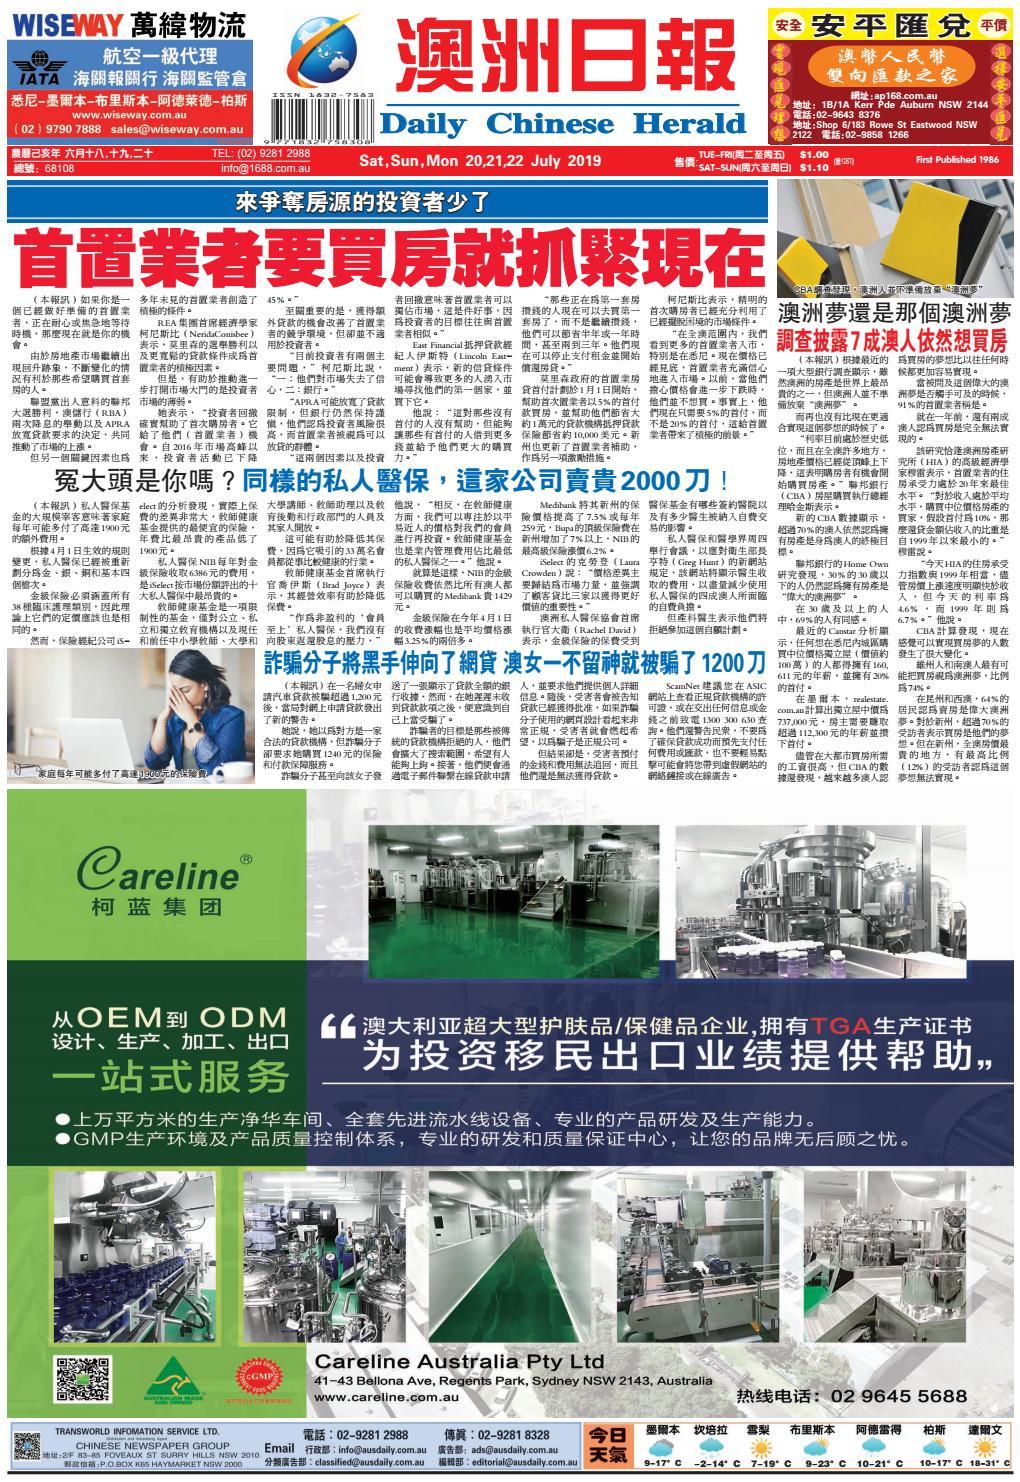 澳洲日报Daily Chinese Herald 20190720 by 1688 Media Group